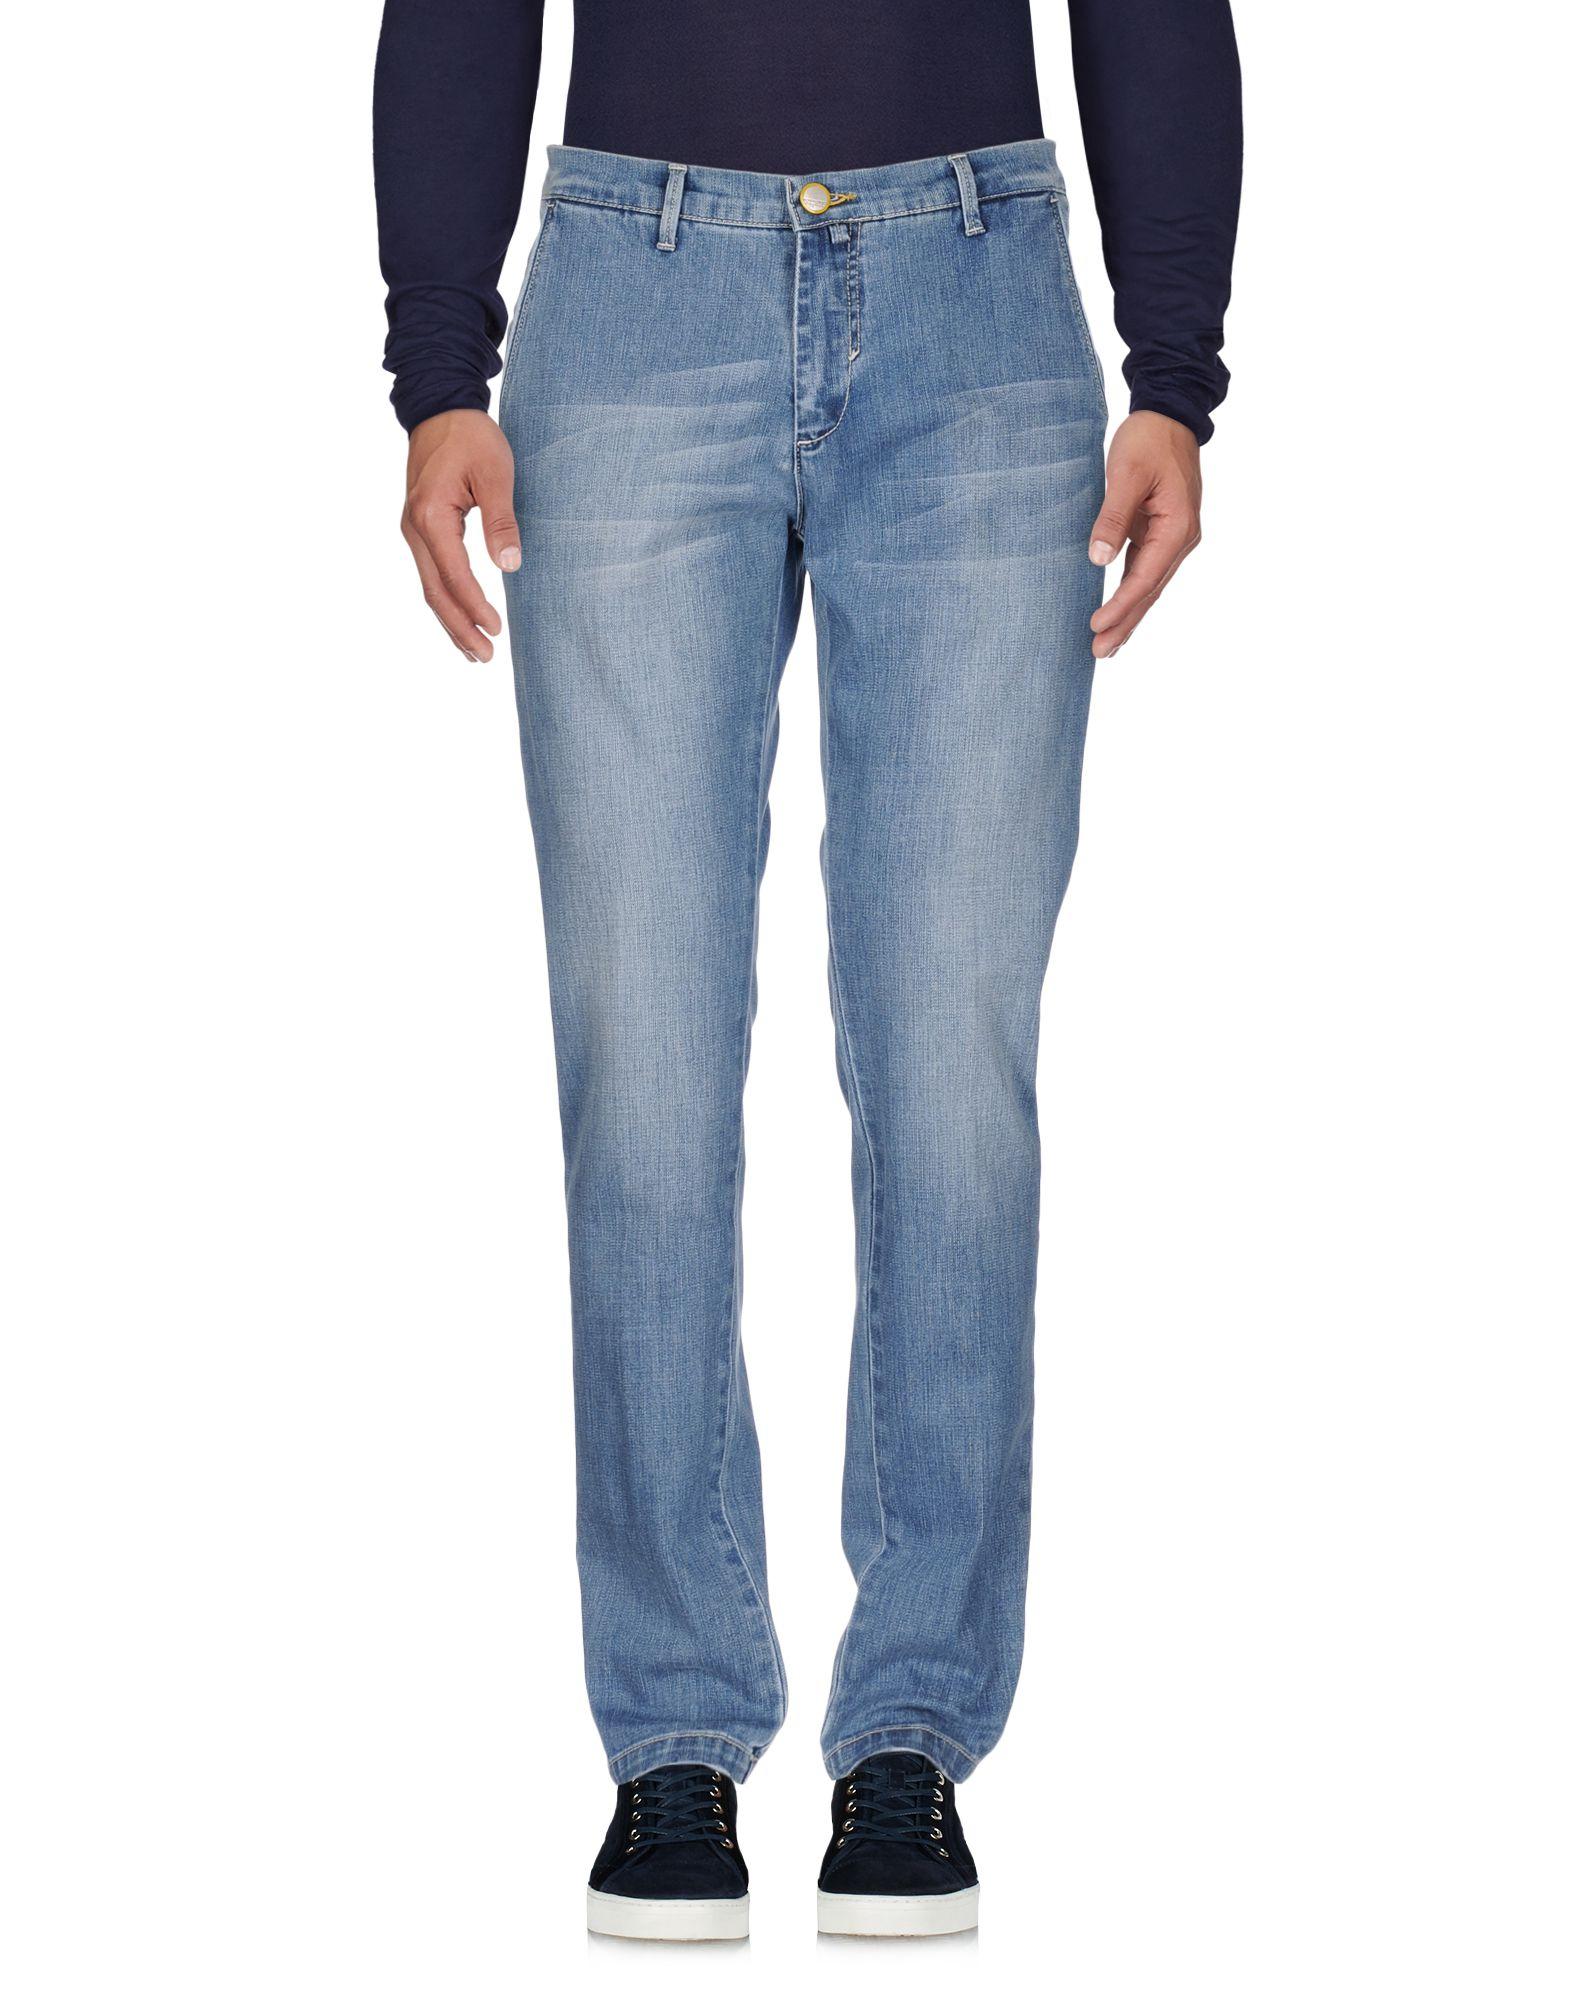 QUOTA OTTO Джинсовые брюки брюки otto цвет коричневый хаки